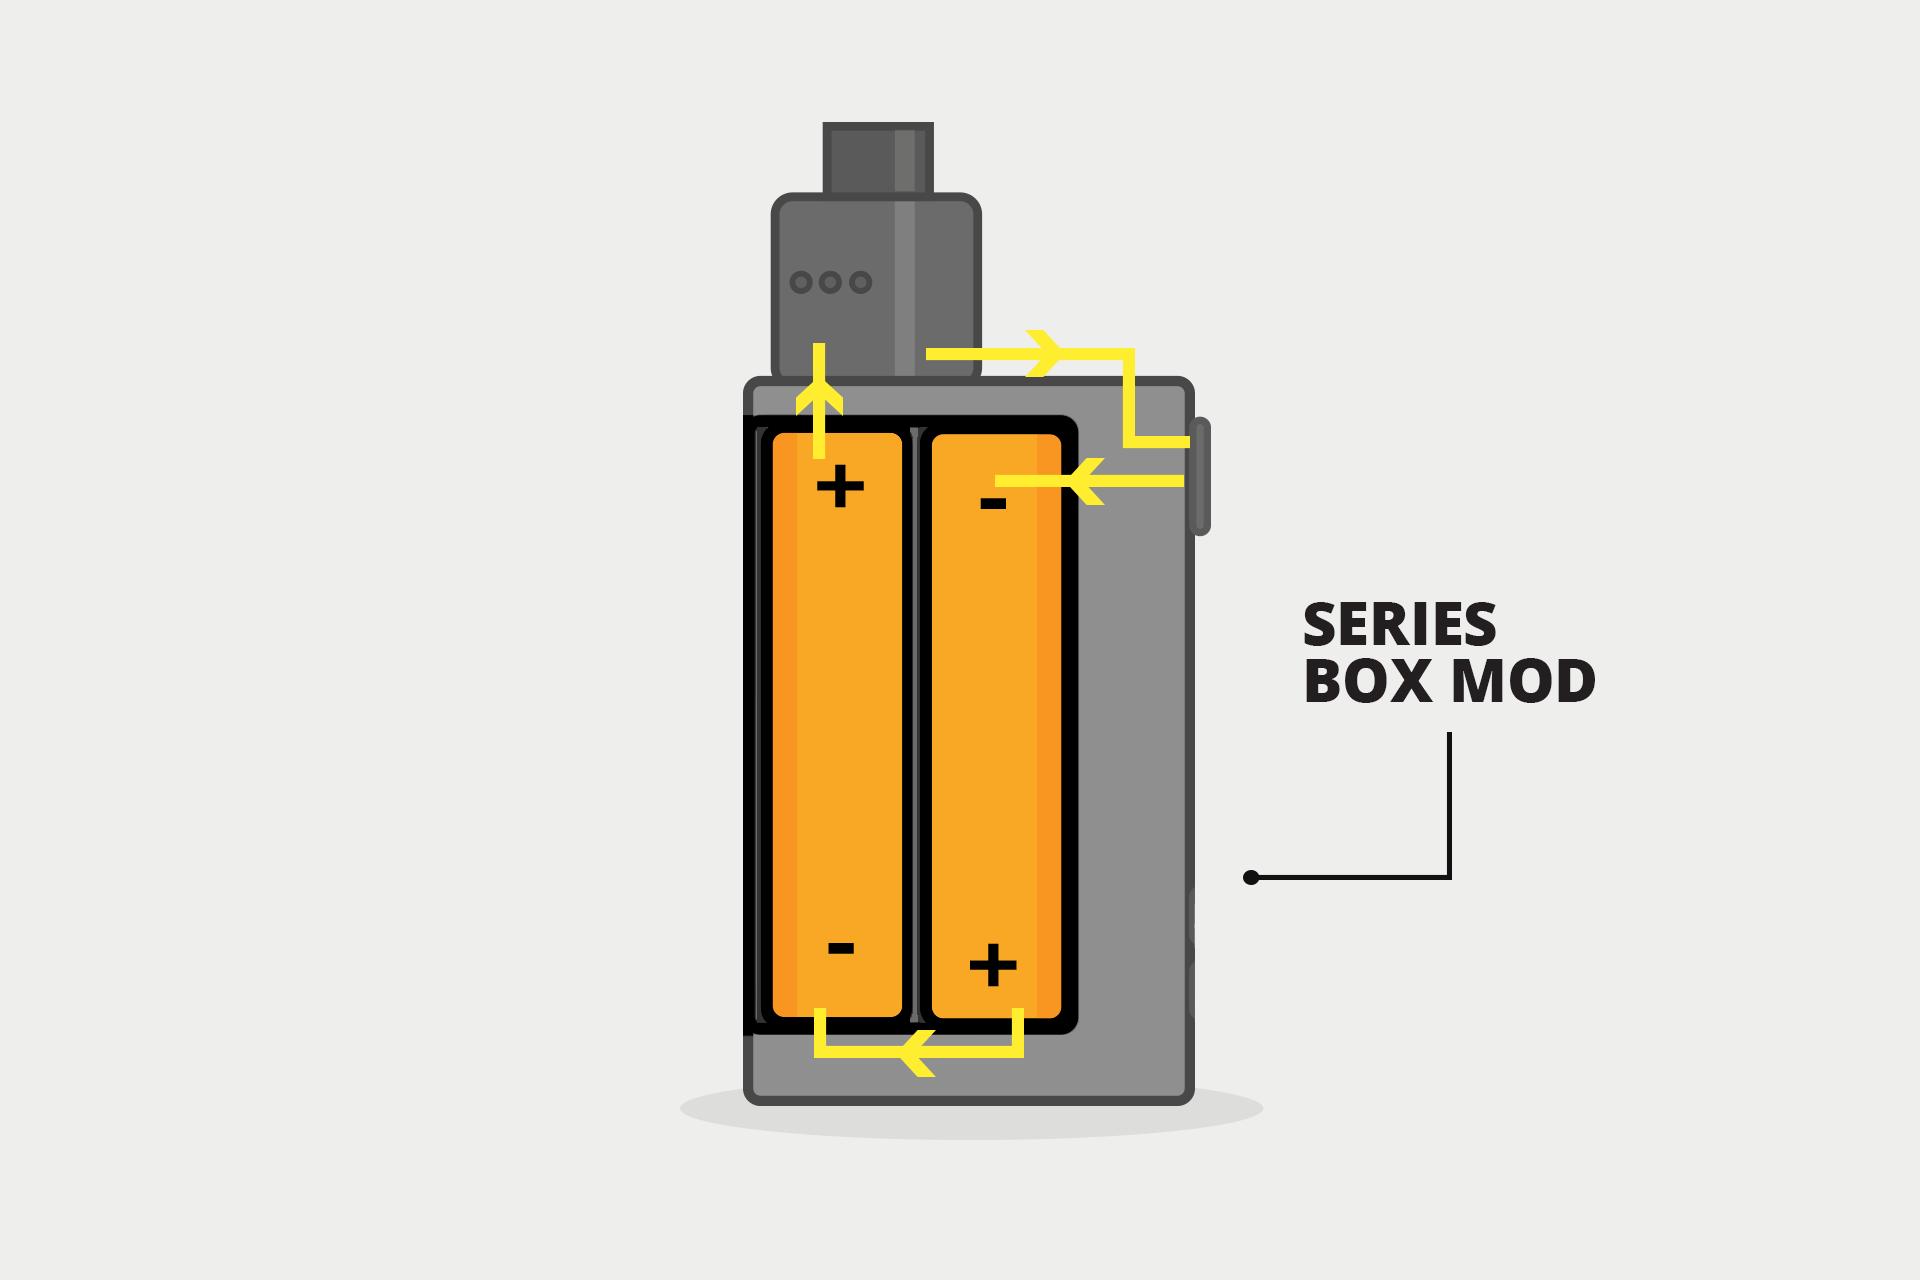 Series box mod circuit